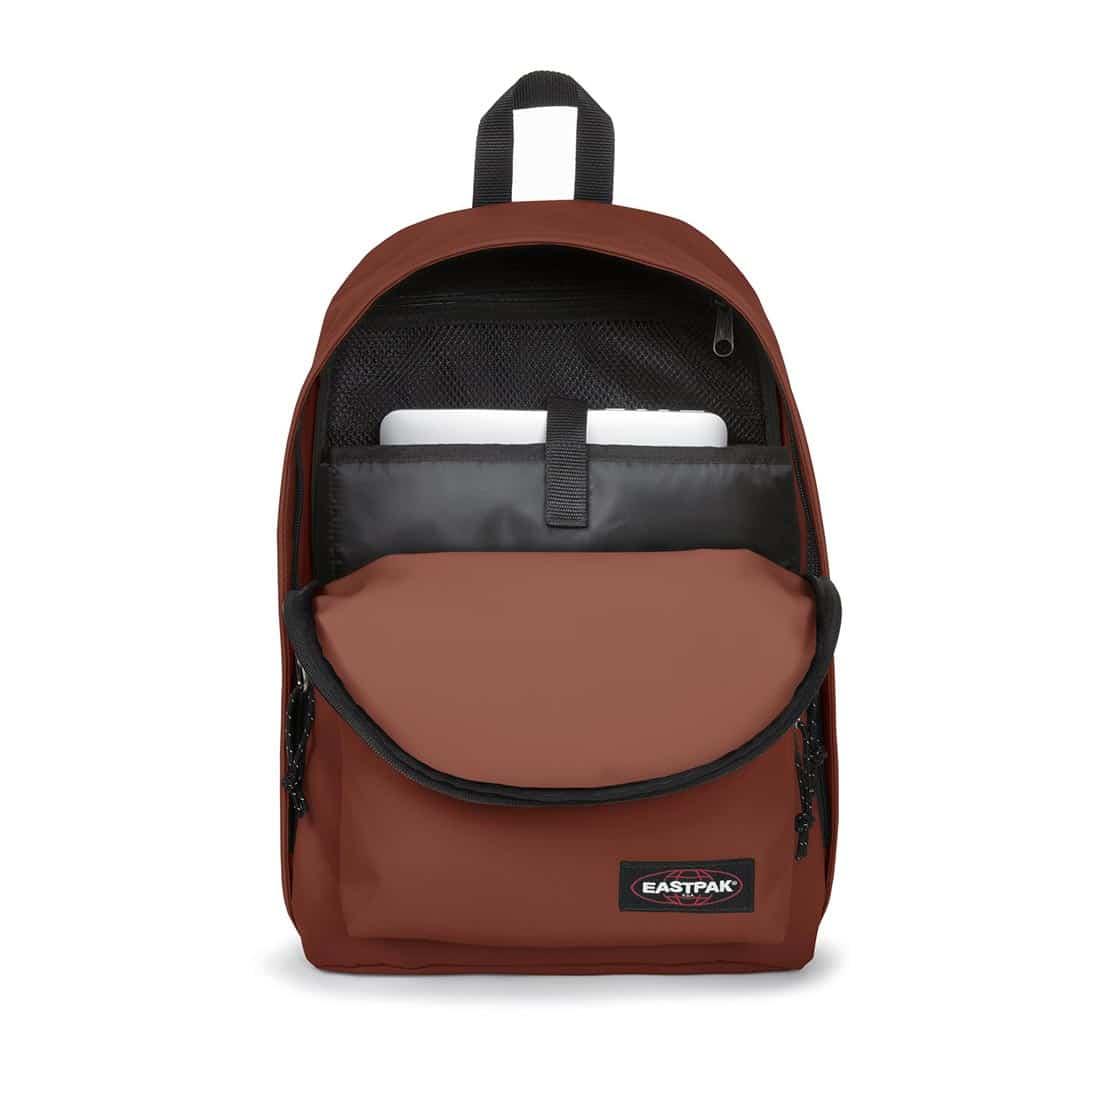 Eastpak Out Of Office 27L Backpack - Bizar Brown